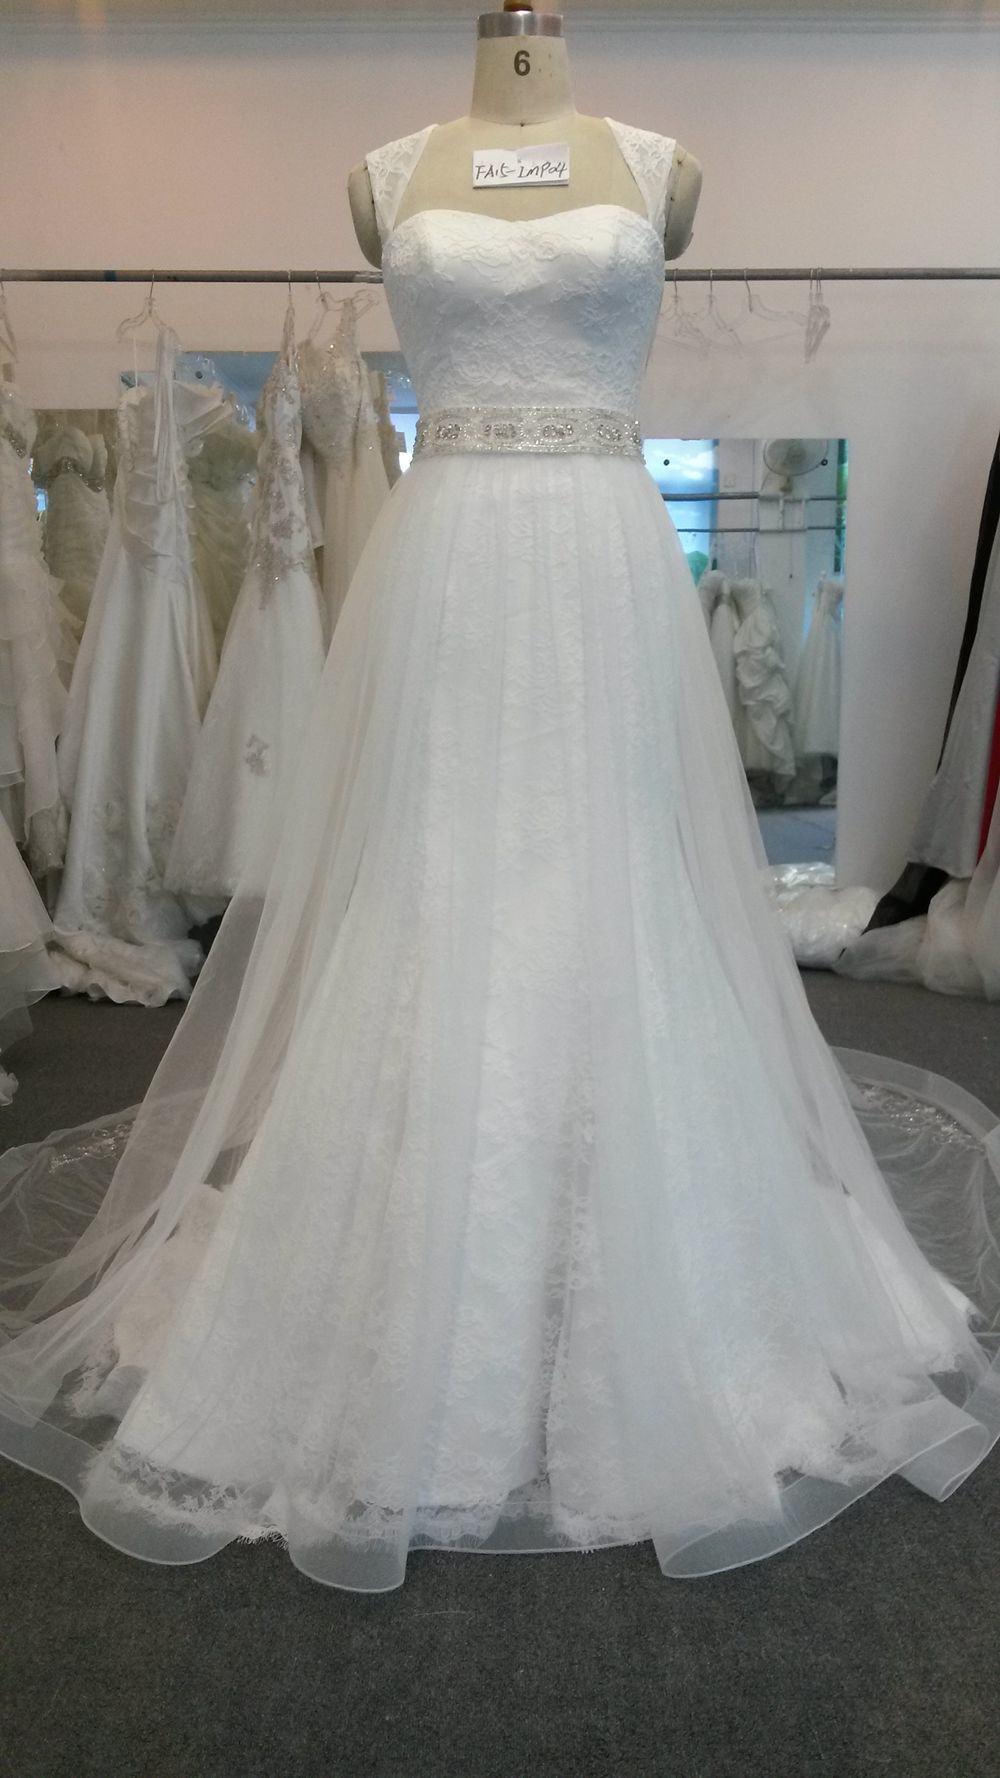 Plus size wedding gown with straps darius cordell for Plus size wedding dresses with straps